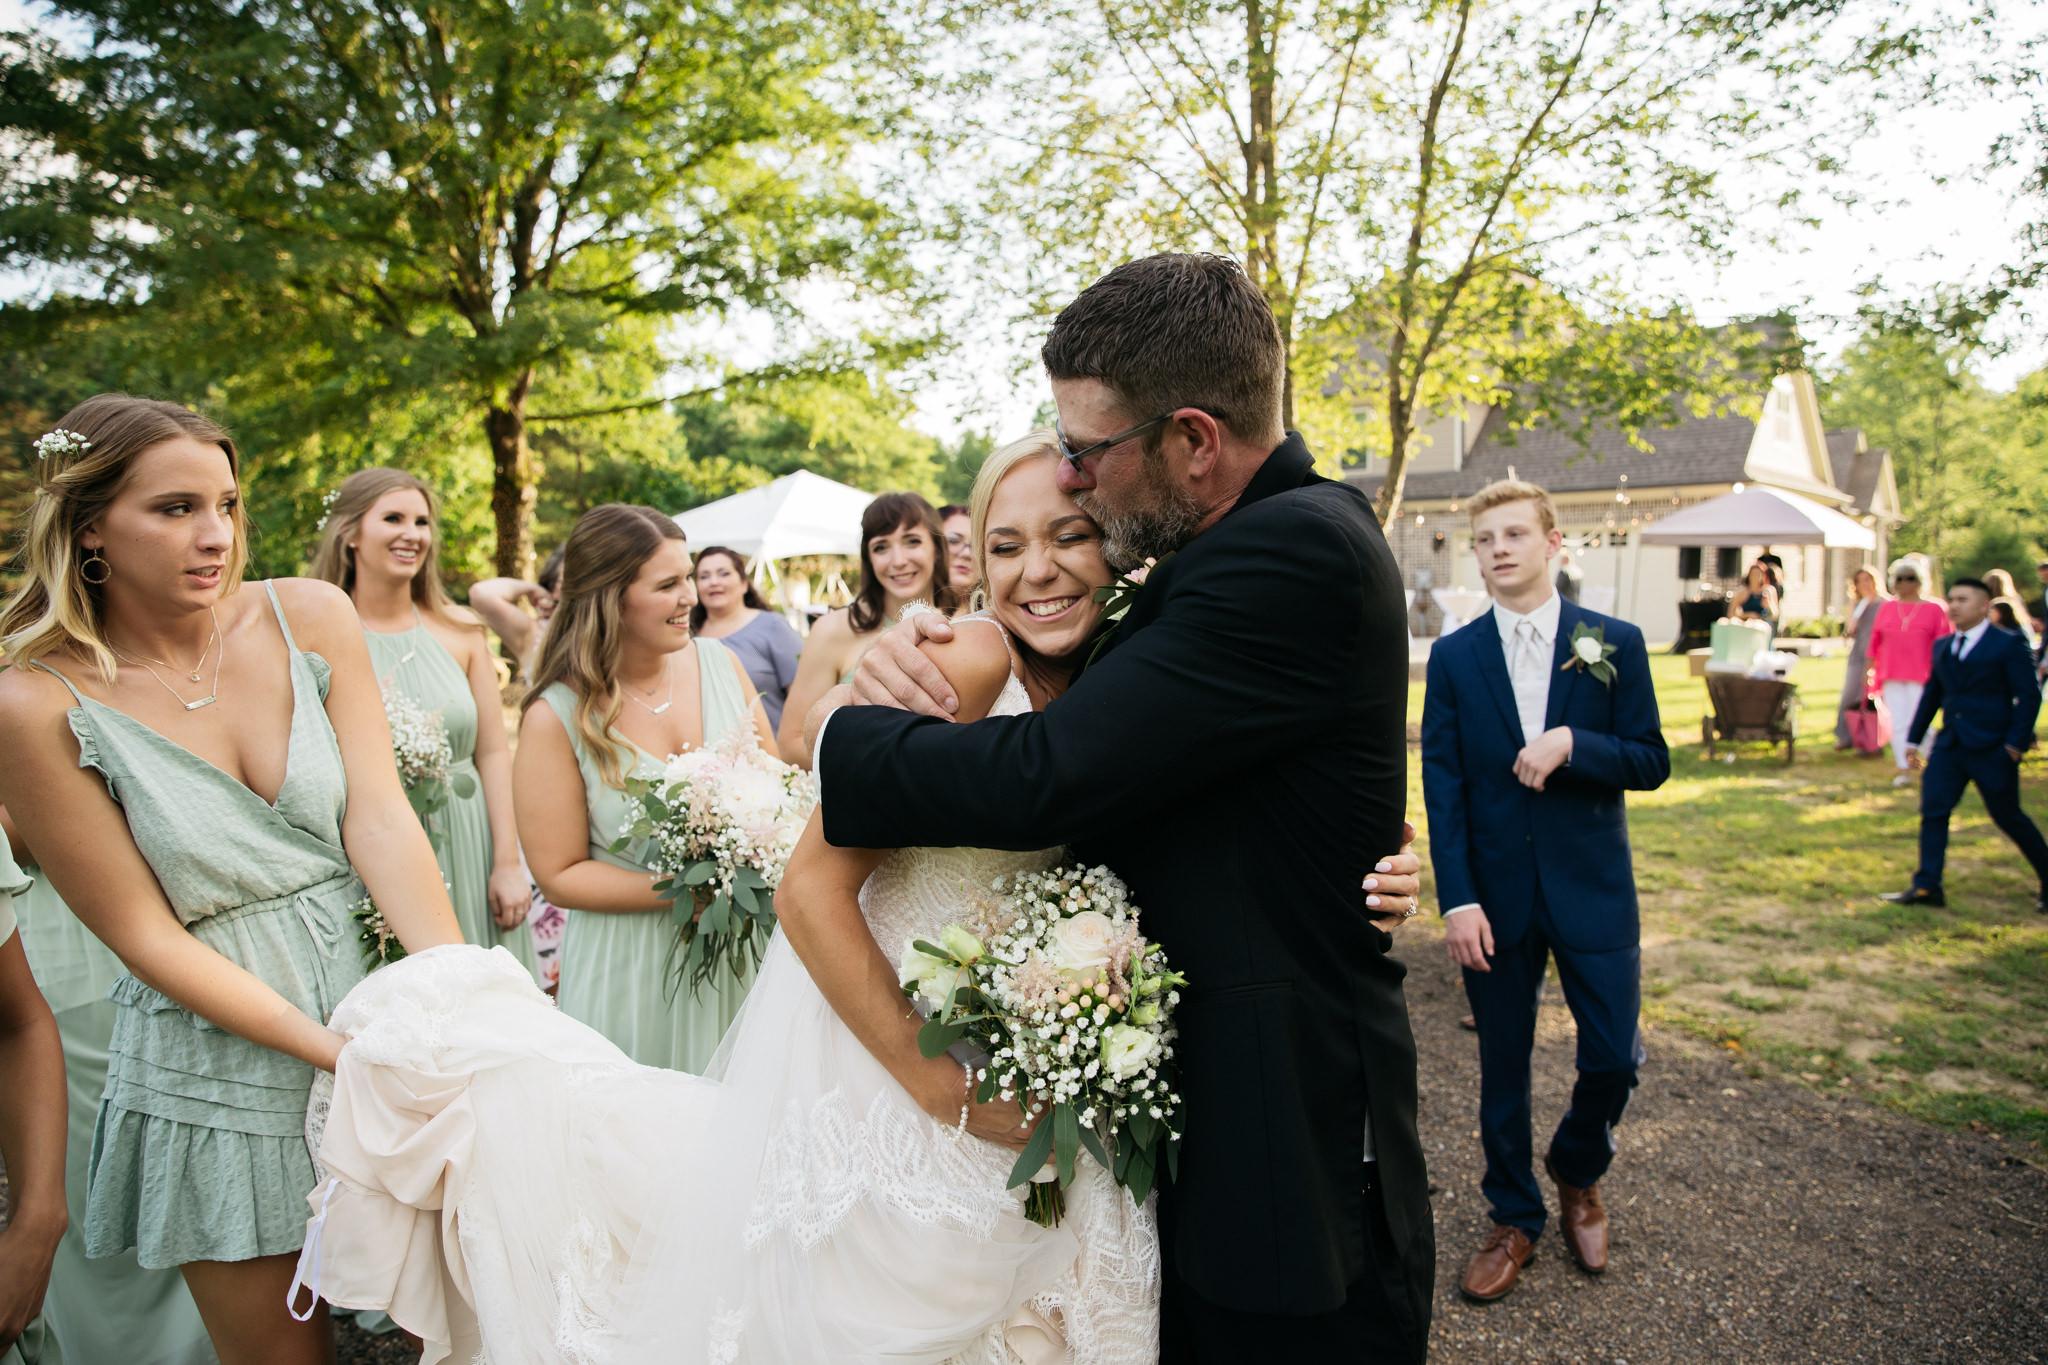 backyard-wedding-thewarmtharoundyou-lexy-branson-60.jpg